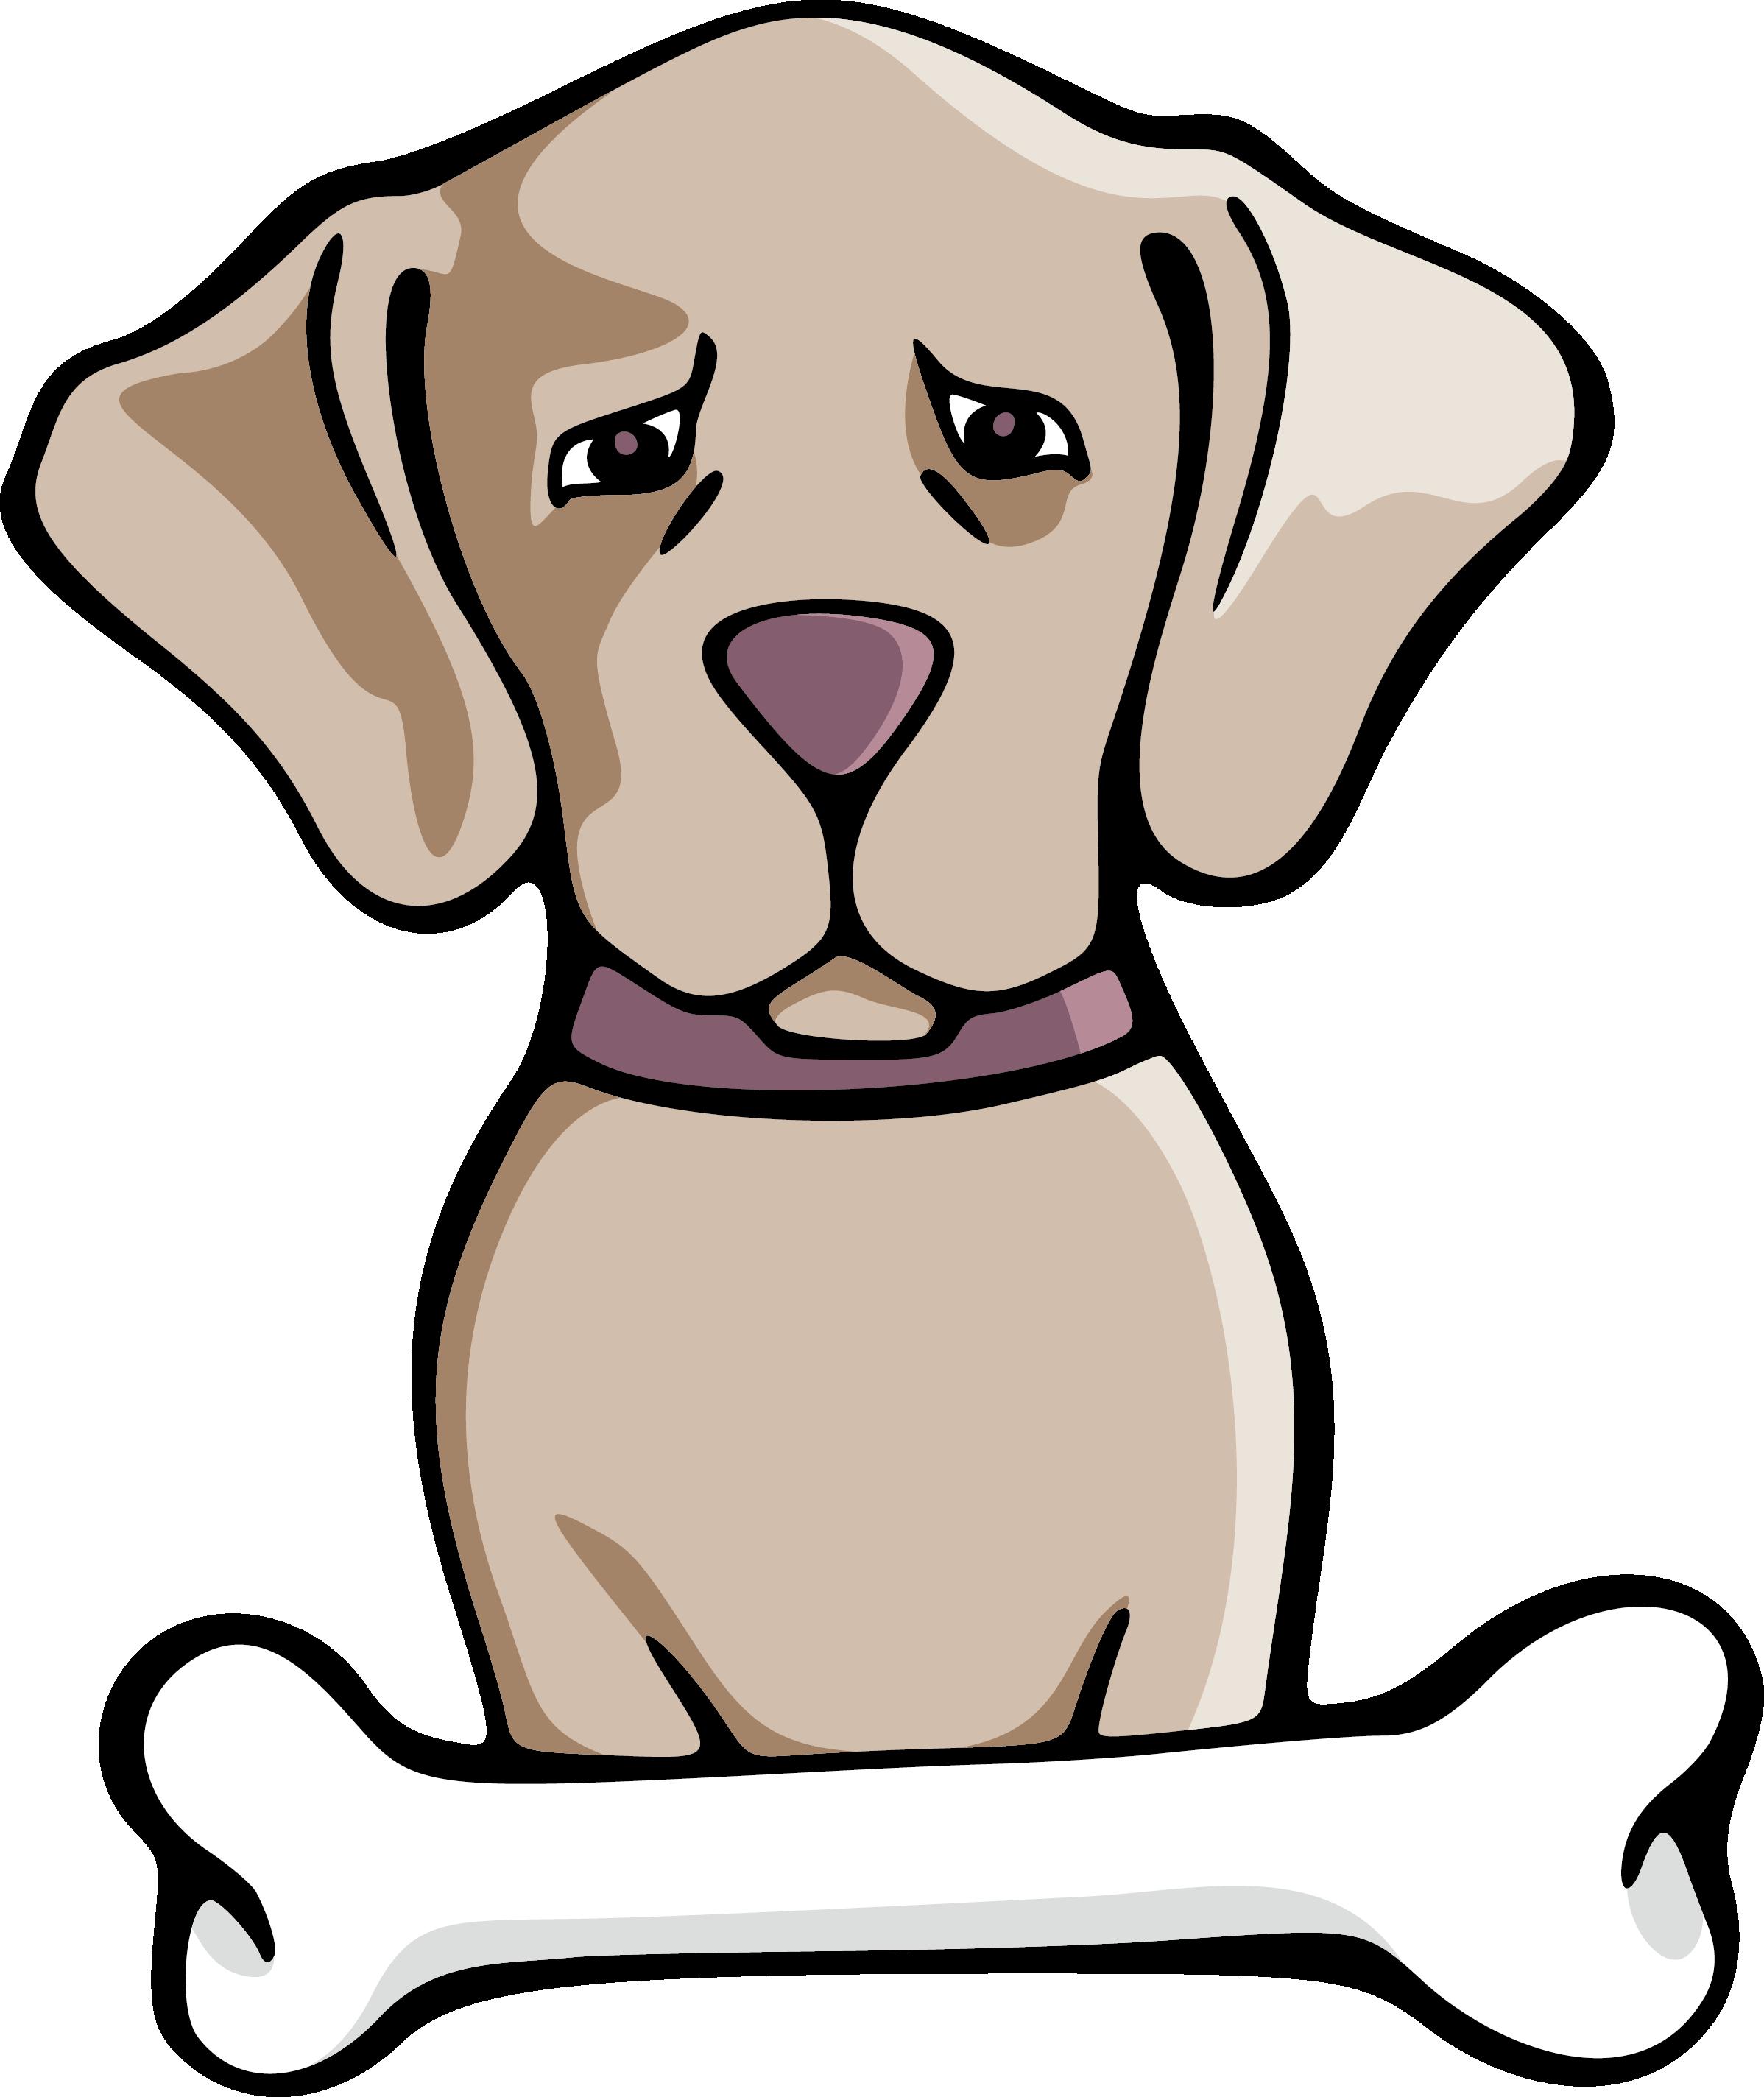 Husky clipart vector. Siberian puppy pet illustration